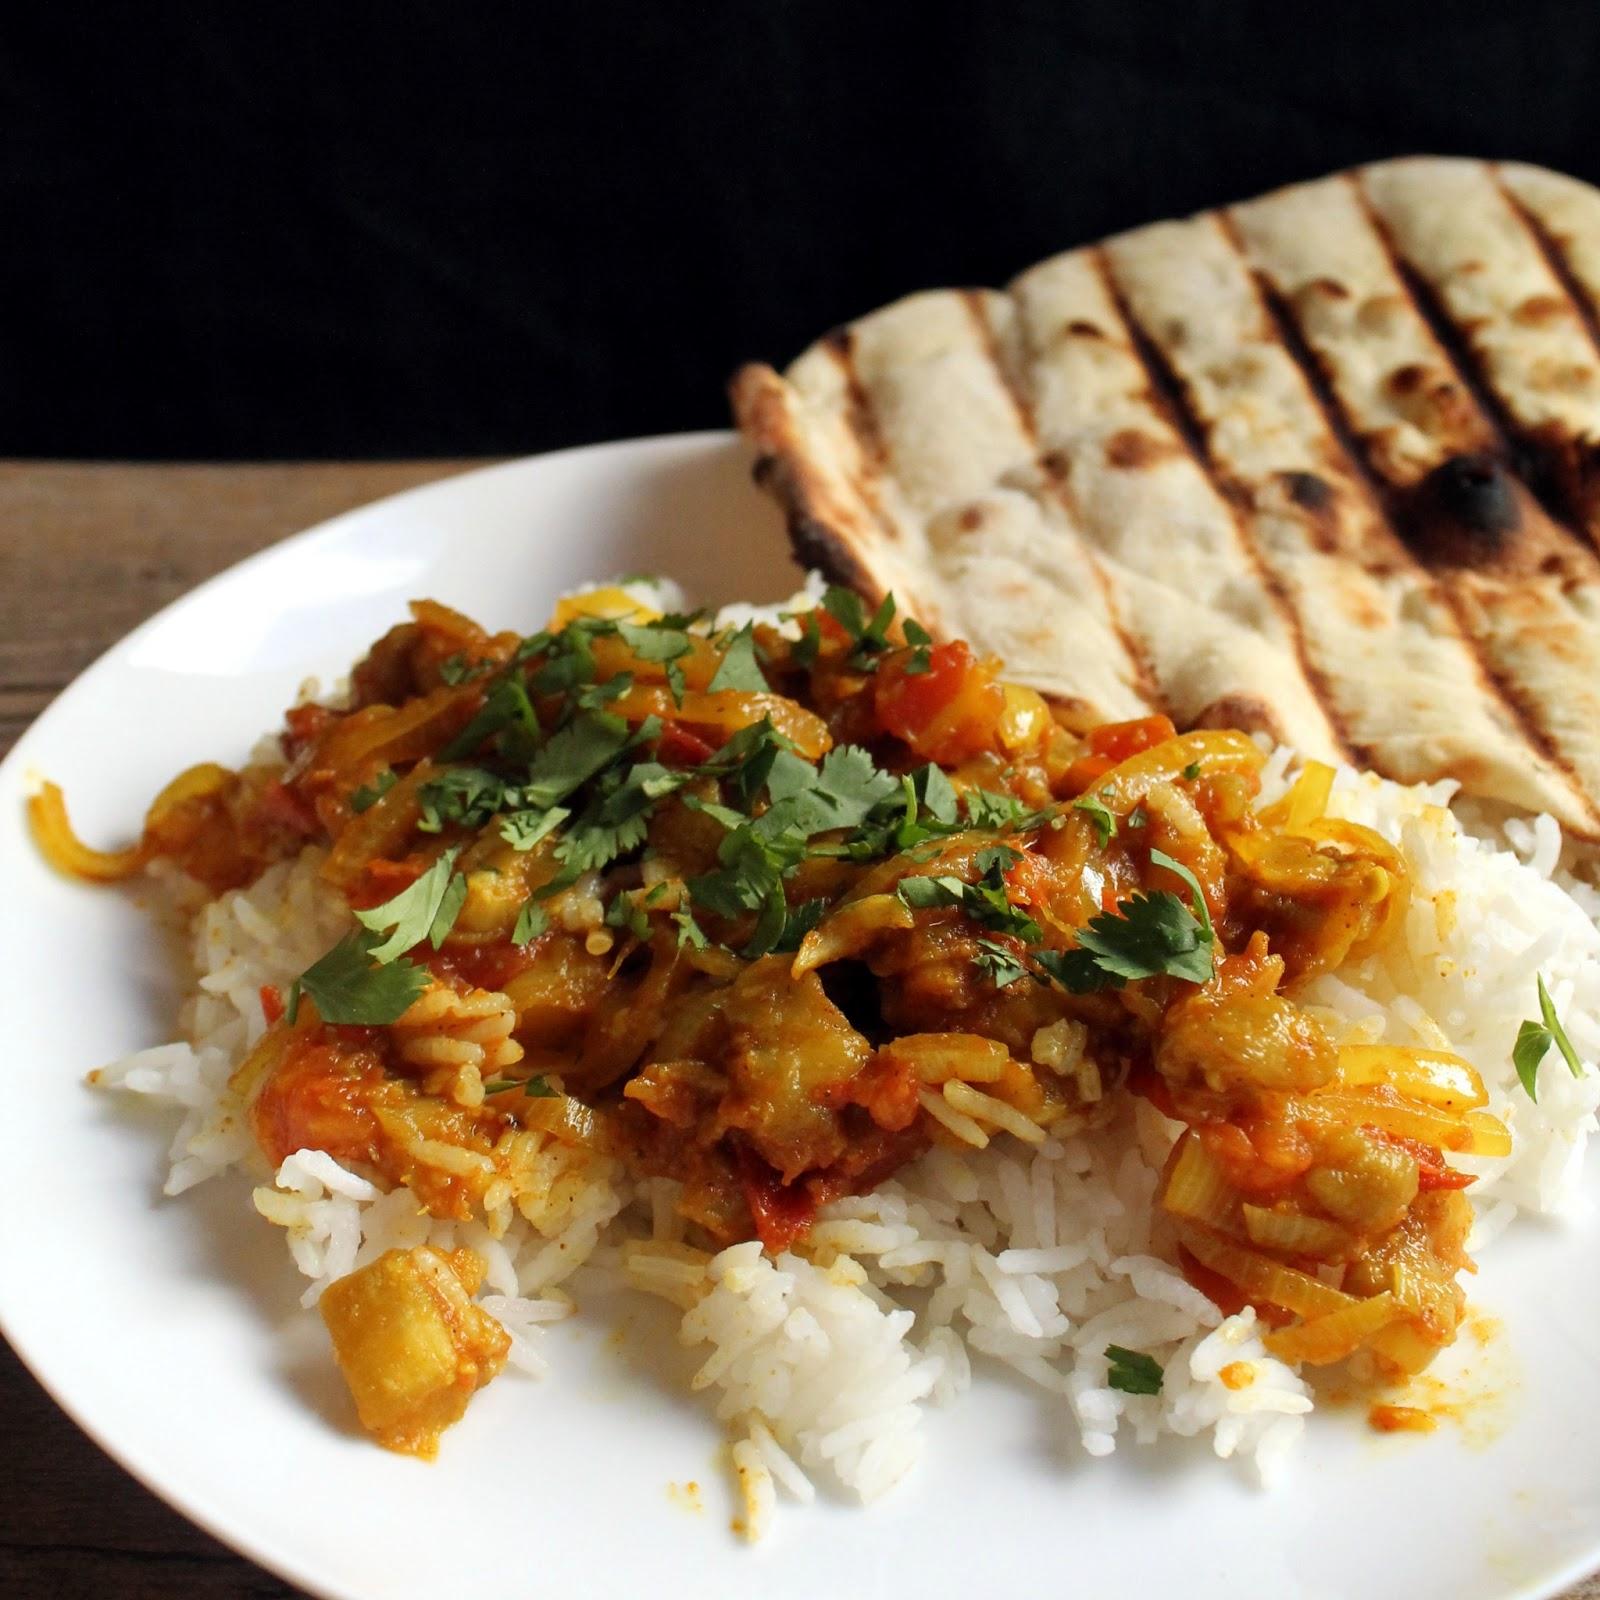 Bangian bhurtha bangian bhurtha indian eggplant and tomato dish forumfinder Image collections